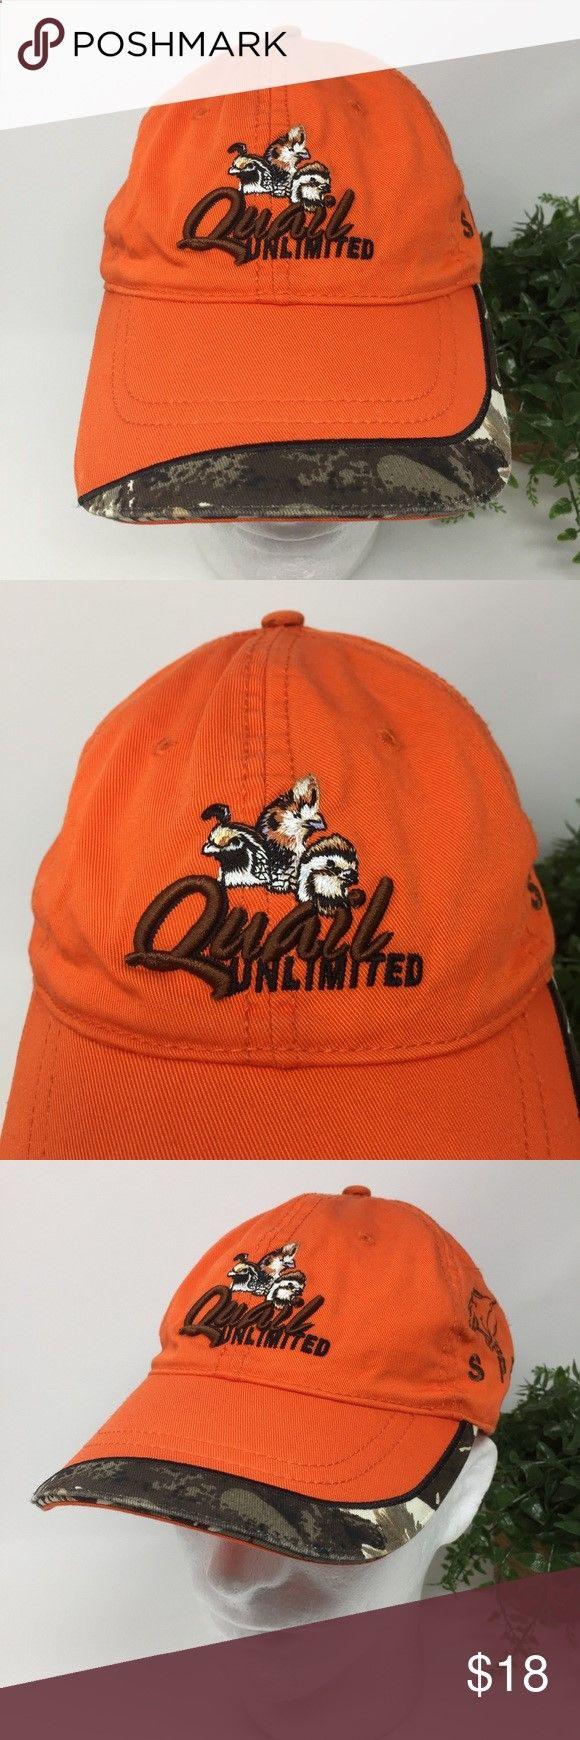 791e3235bfd Quail Unlimited Hunters Orange and Camouflage Hat Atlanta Cap Company Quail  Unlimited Hunters Orange Camouflage Hat